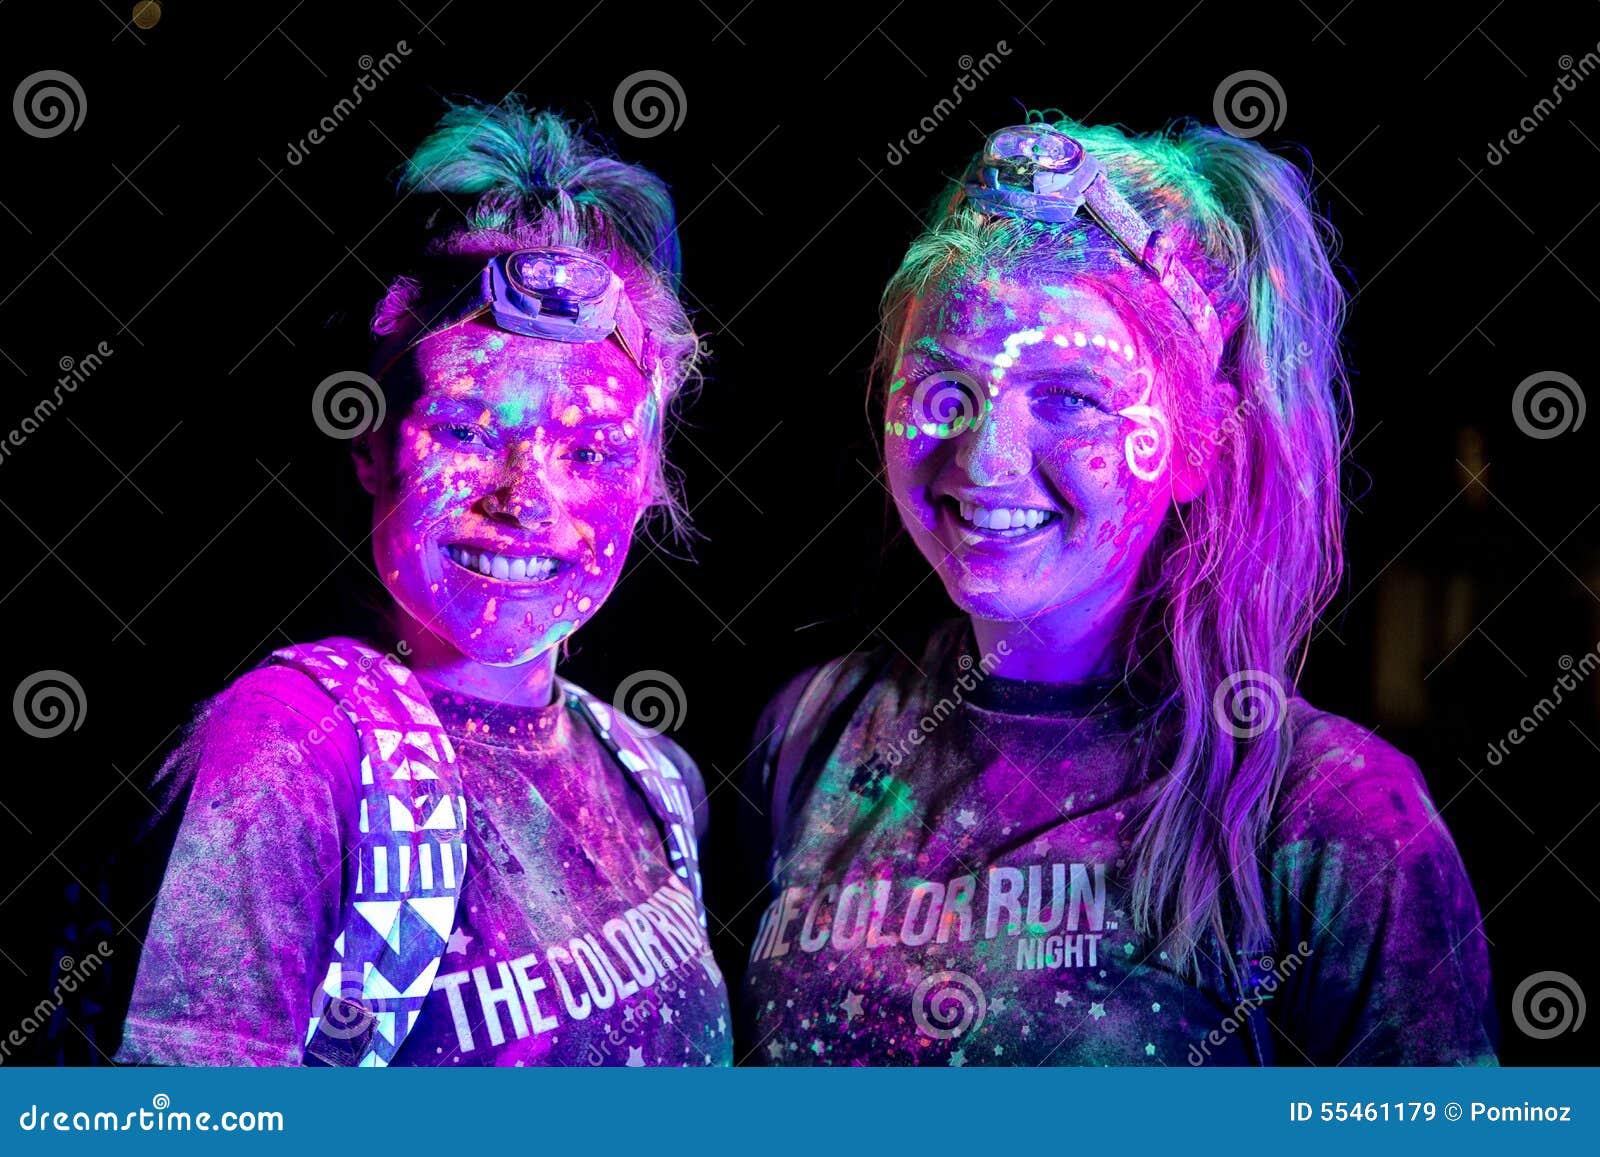 Uv Face Paint Sydney